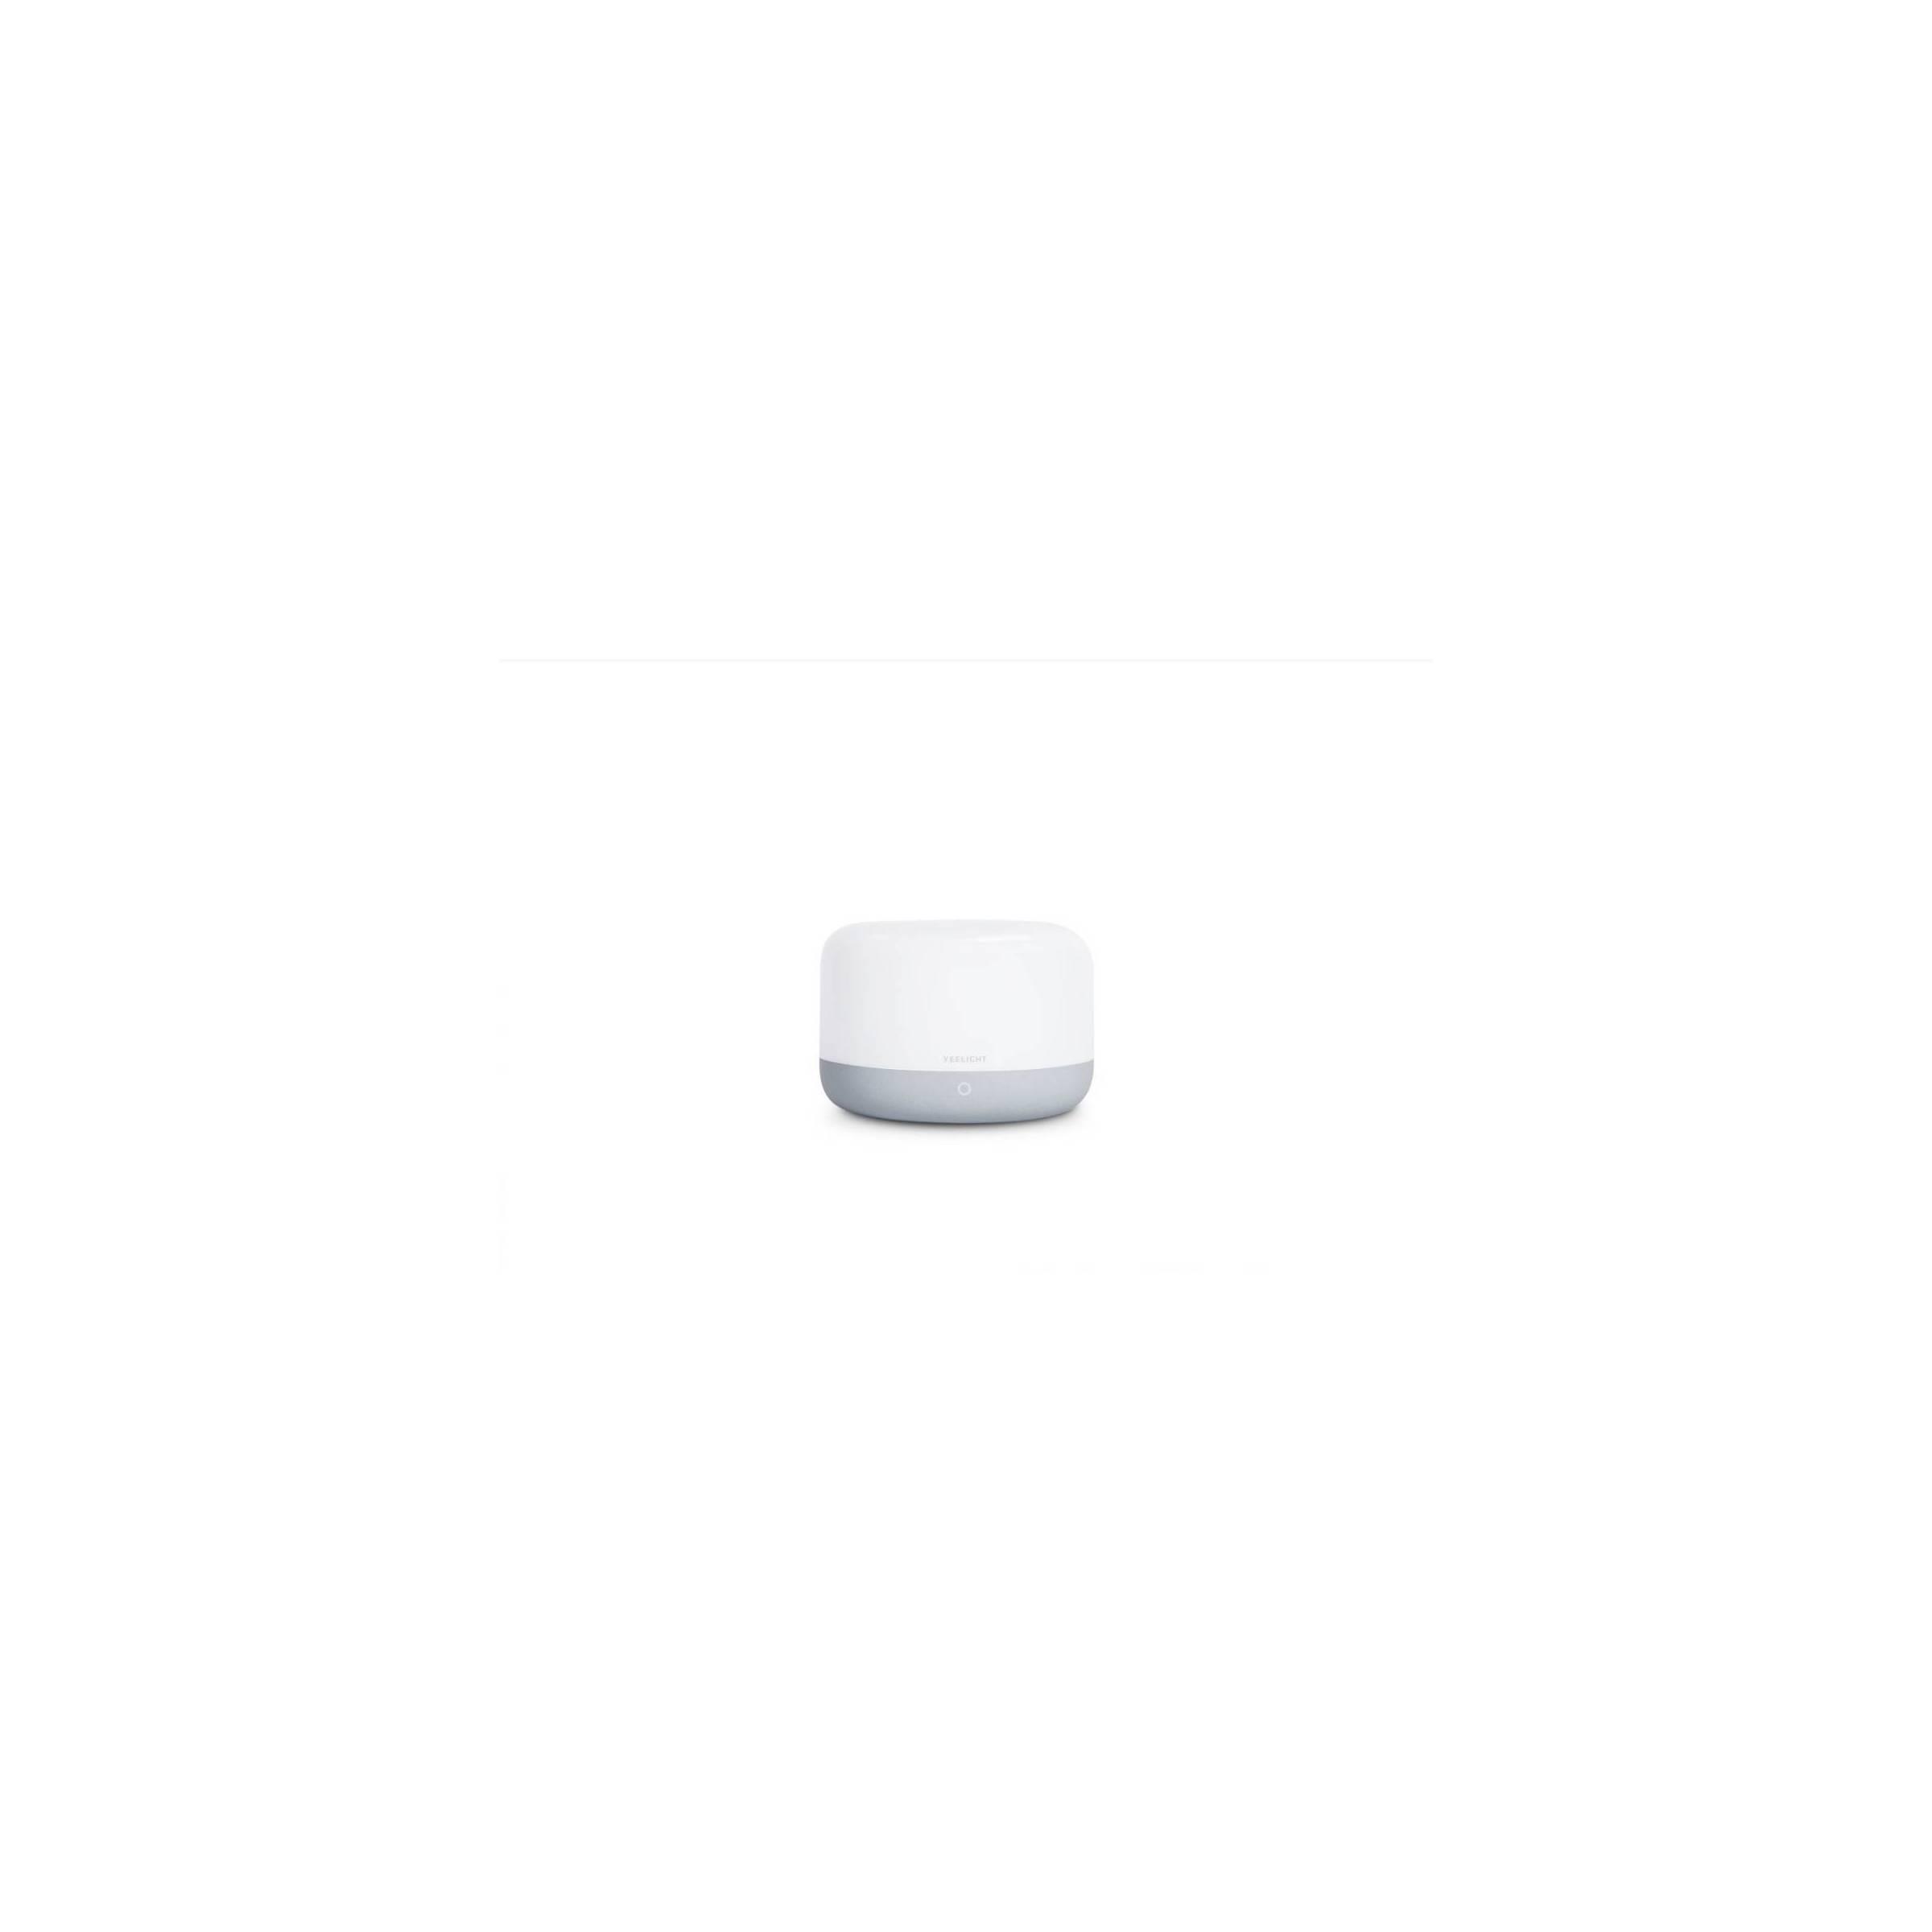 yeelight – Yeelight d2 nattelampe m. touch kontrol & homekit (eu) fra mackabler.dk